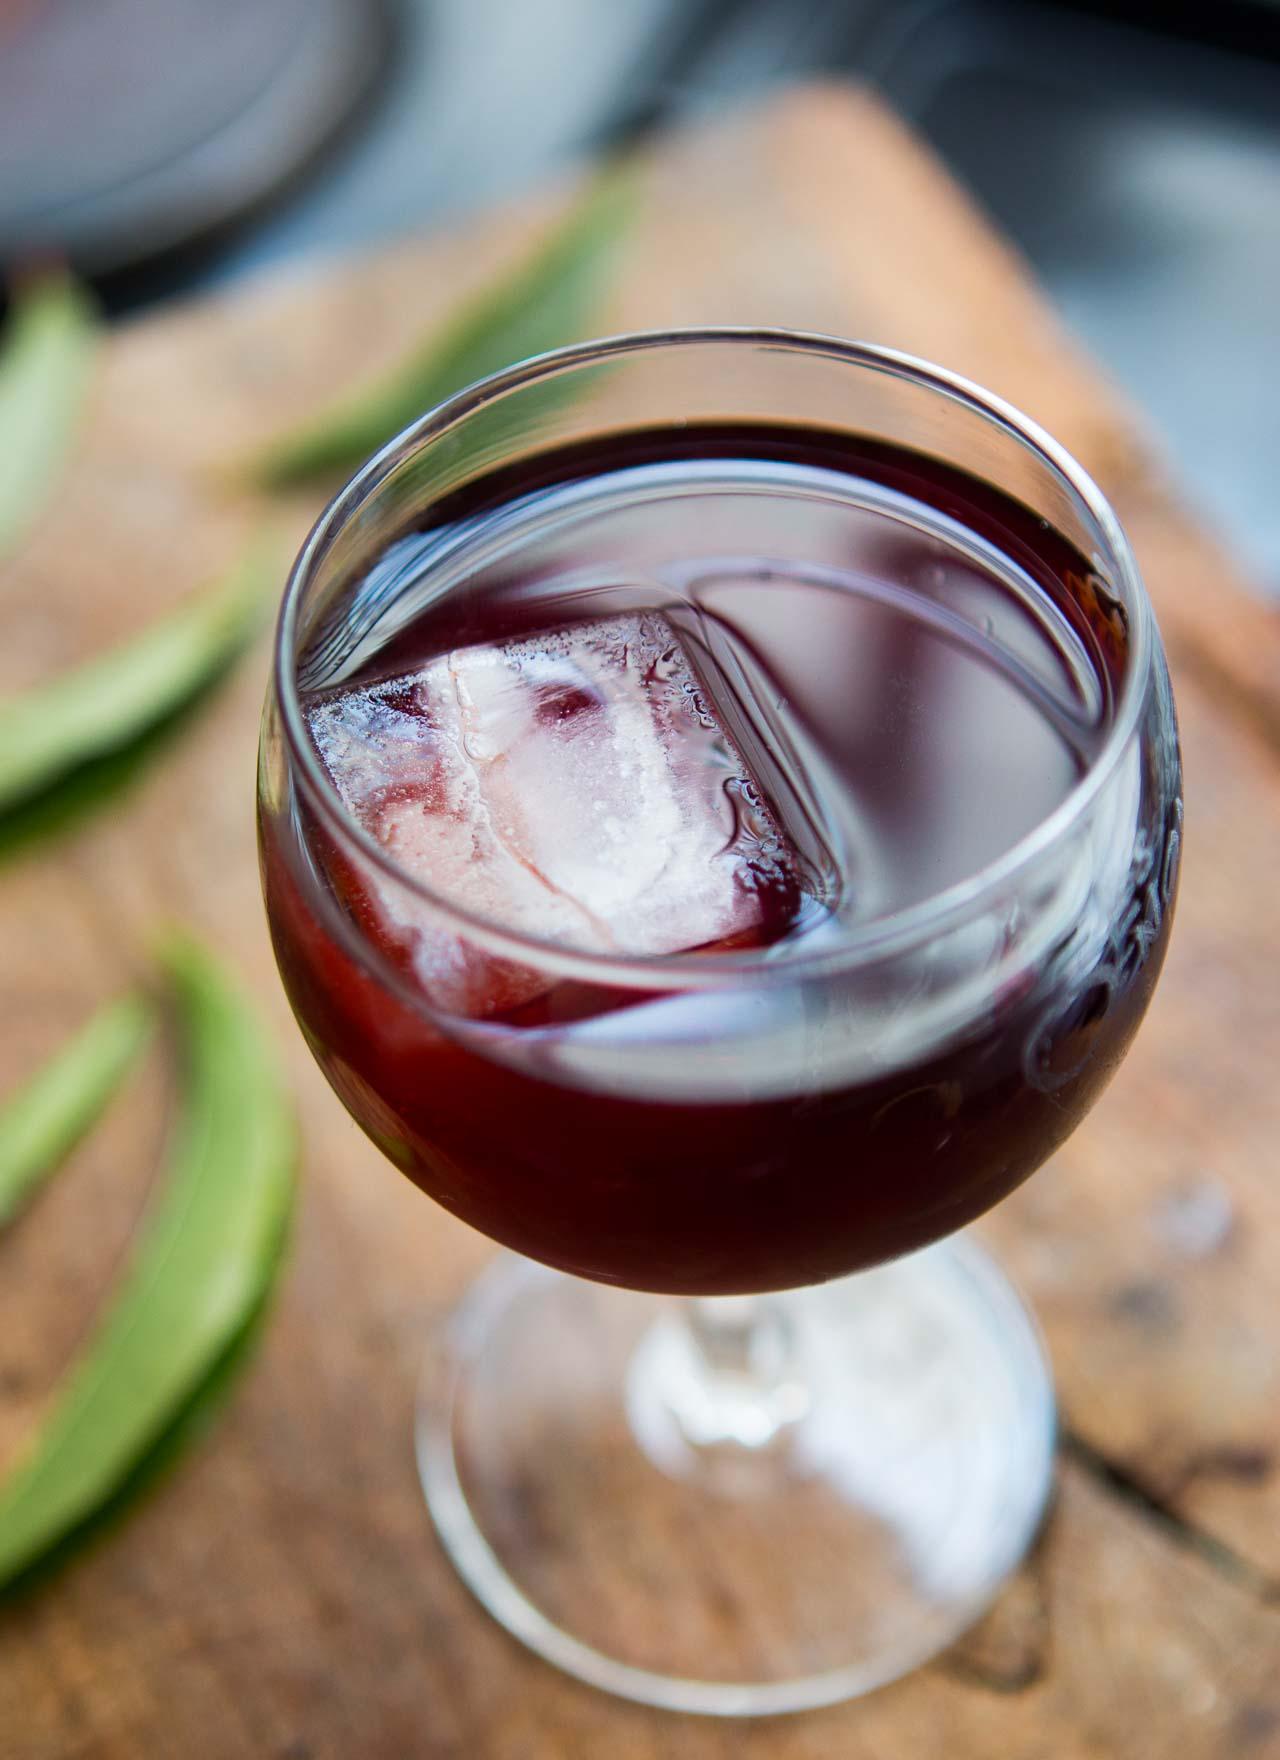 Vin de peche: Peach Leaf Wine